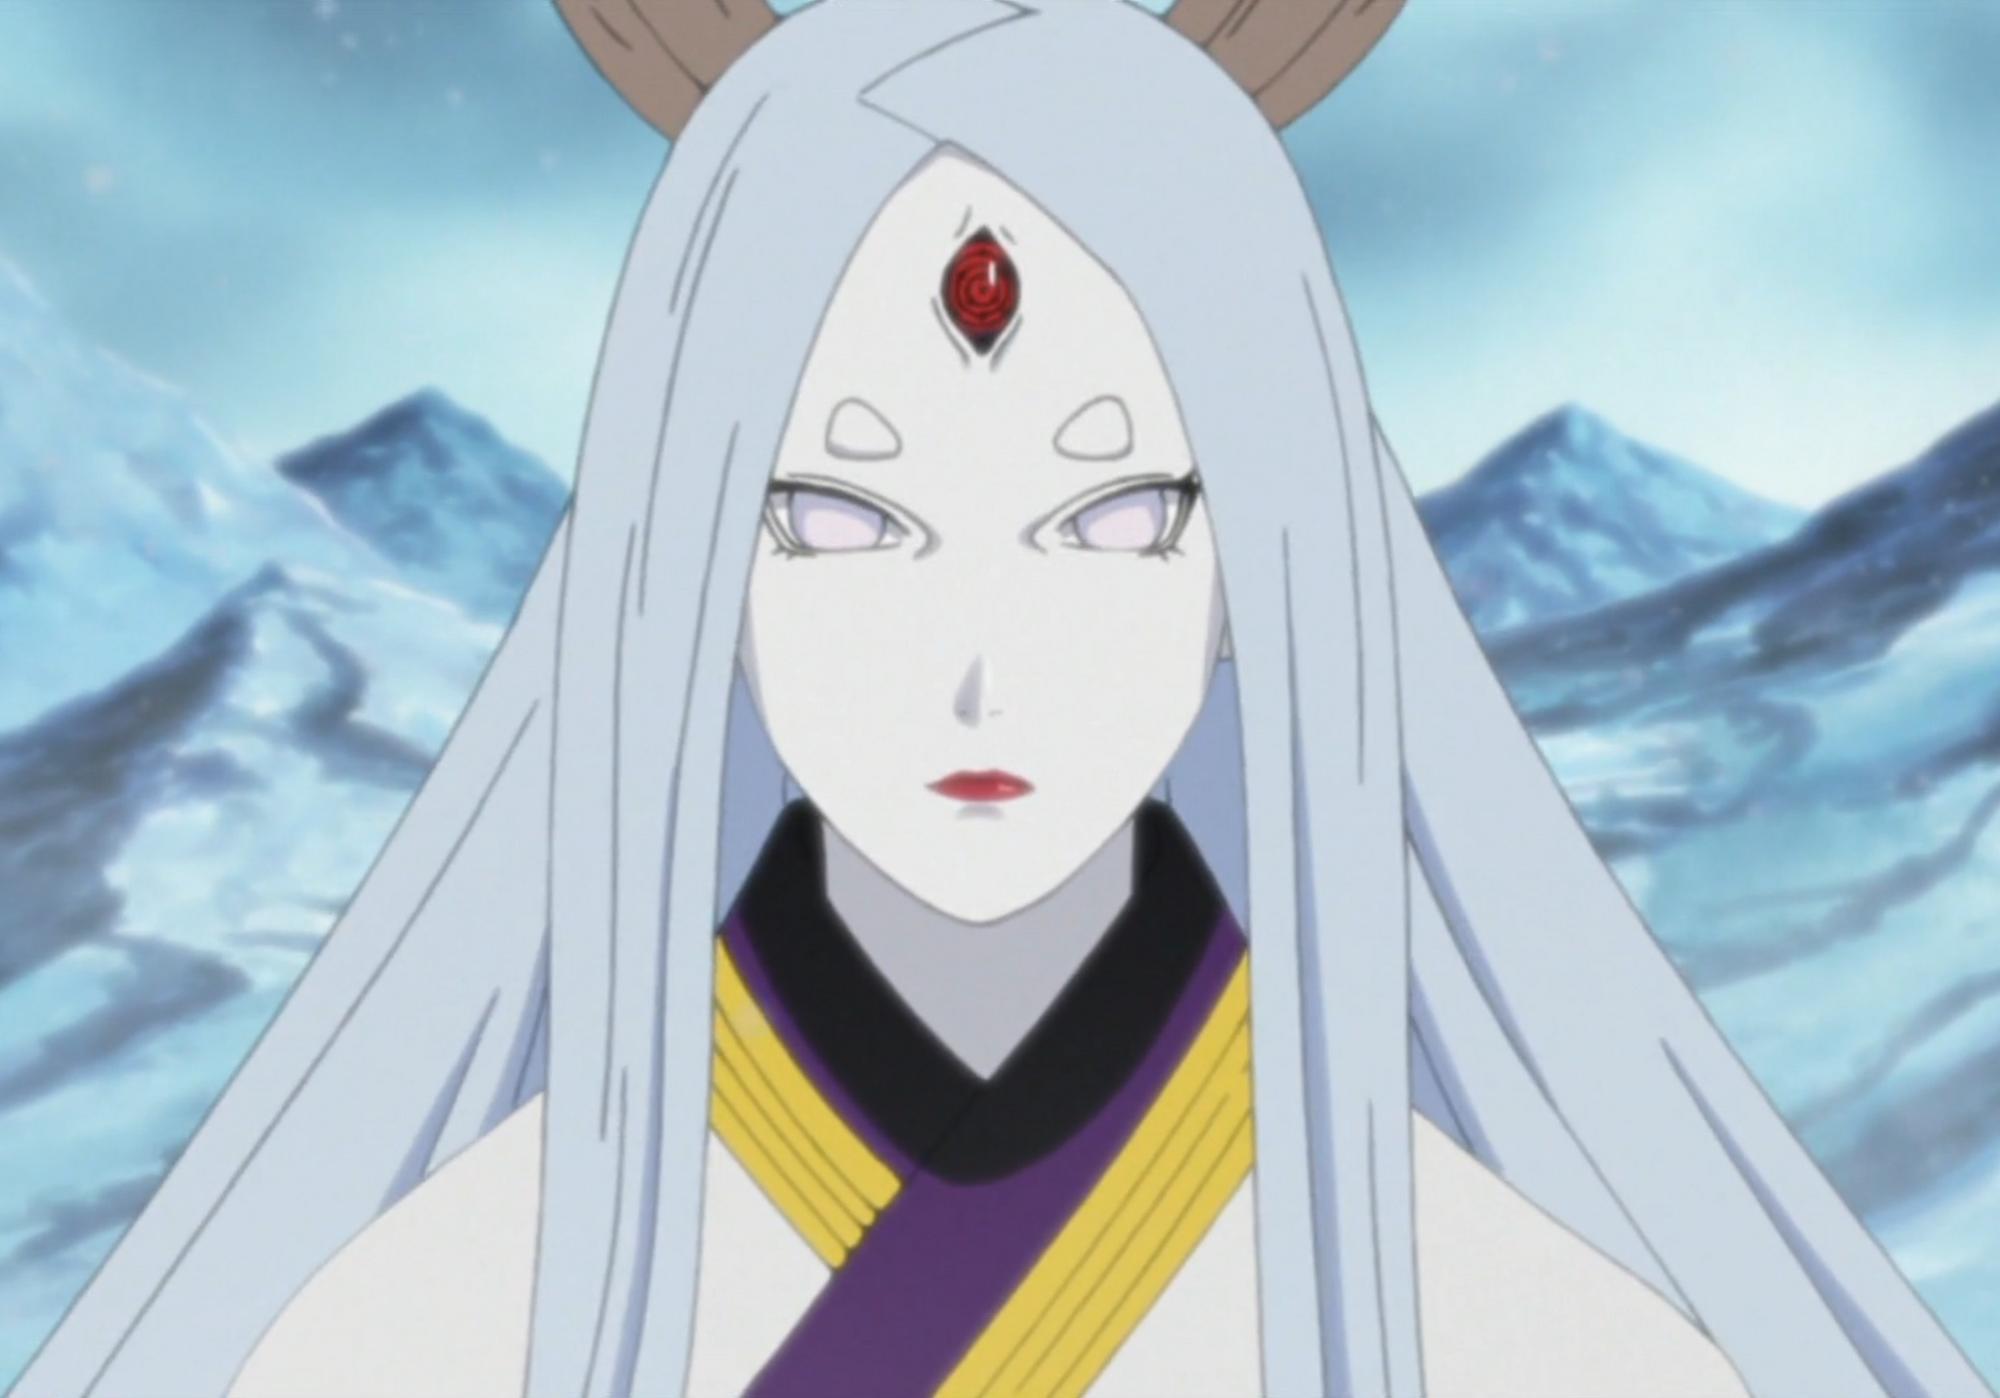 500 Gambar 2 Dimensi Naruto HD Paling Keren Infobaru